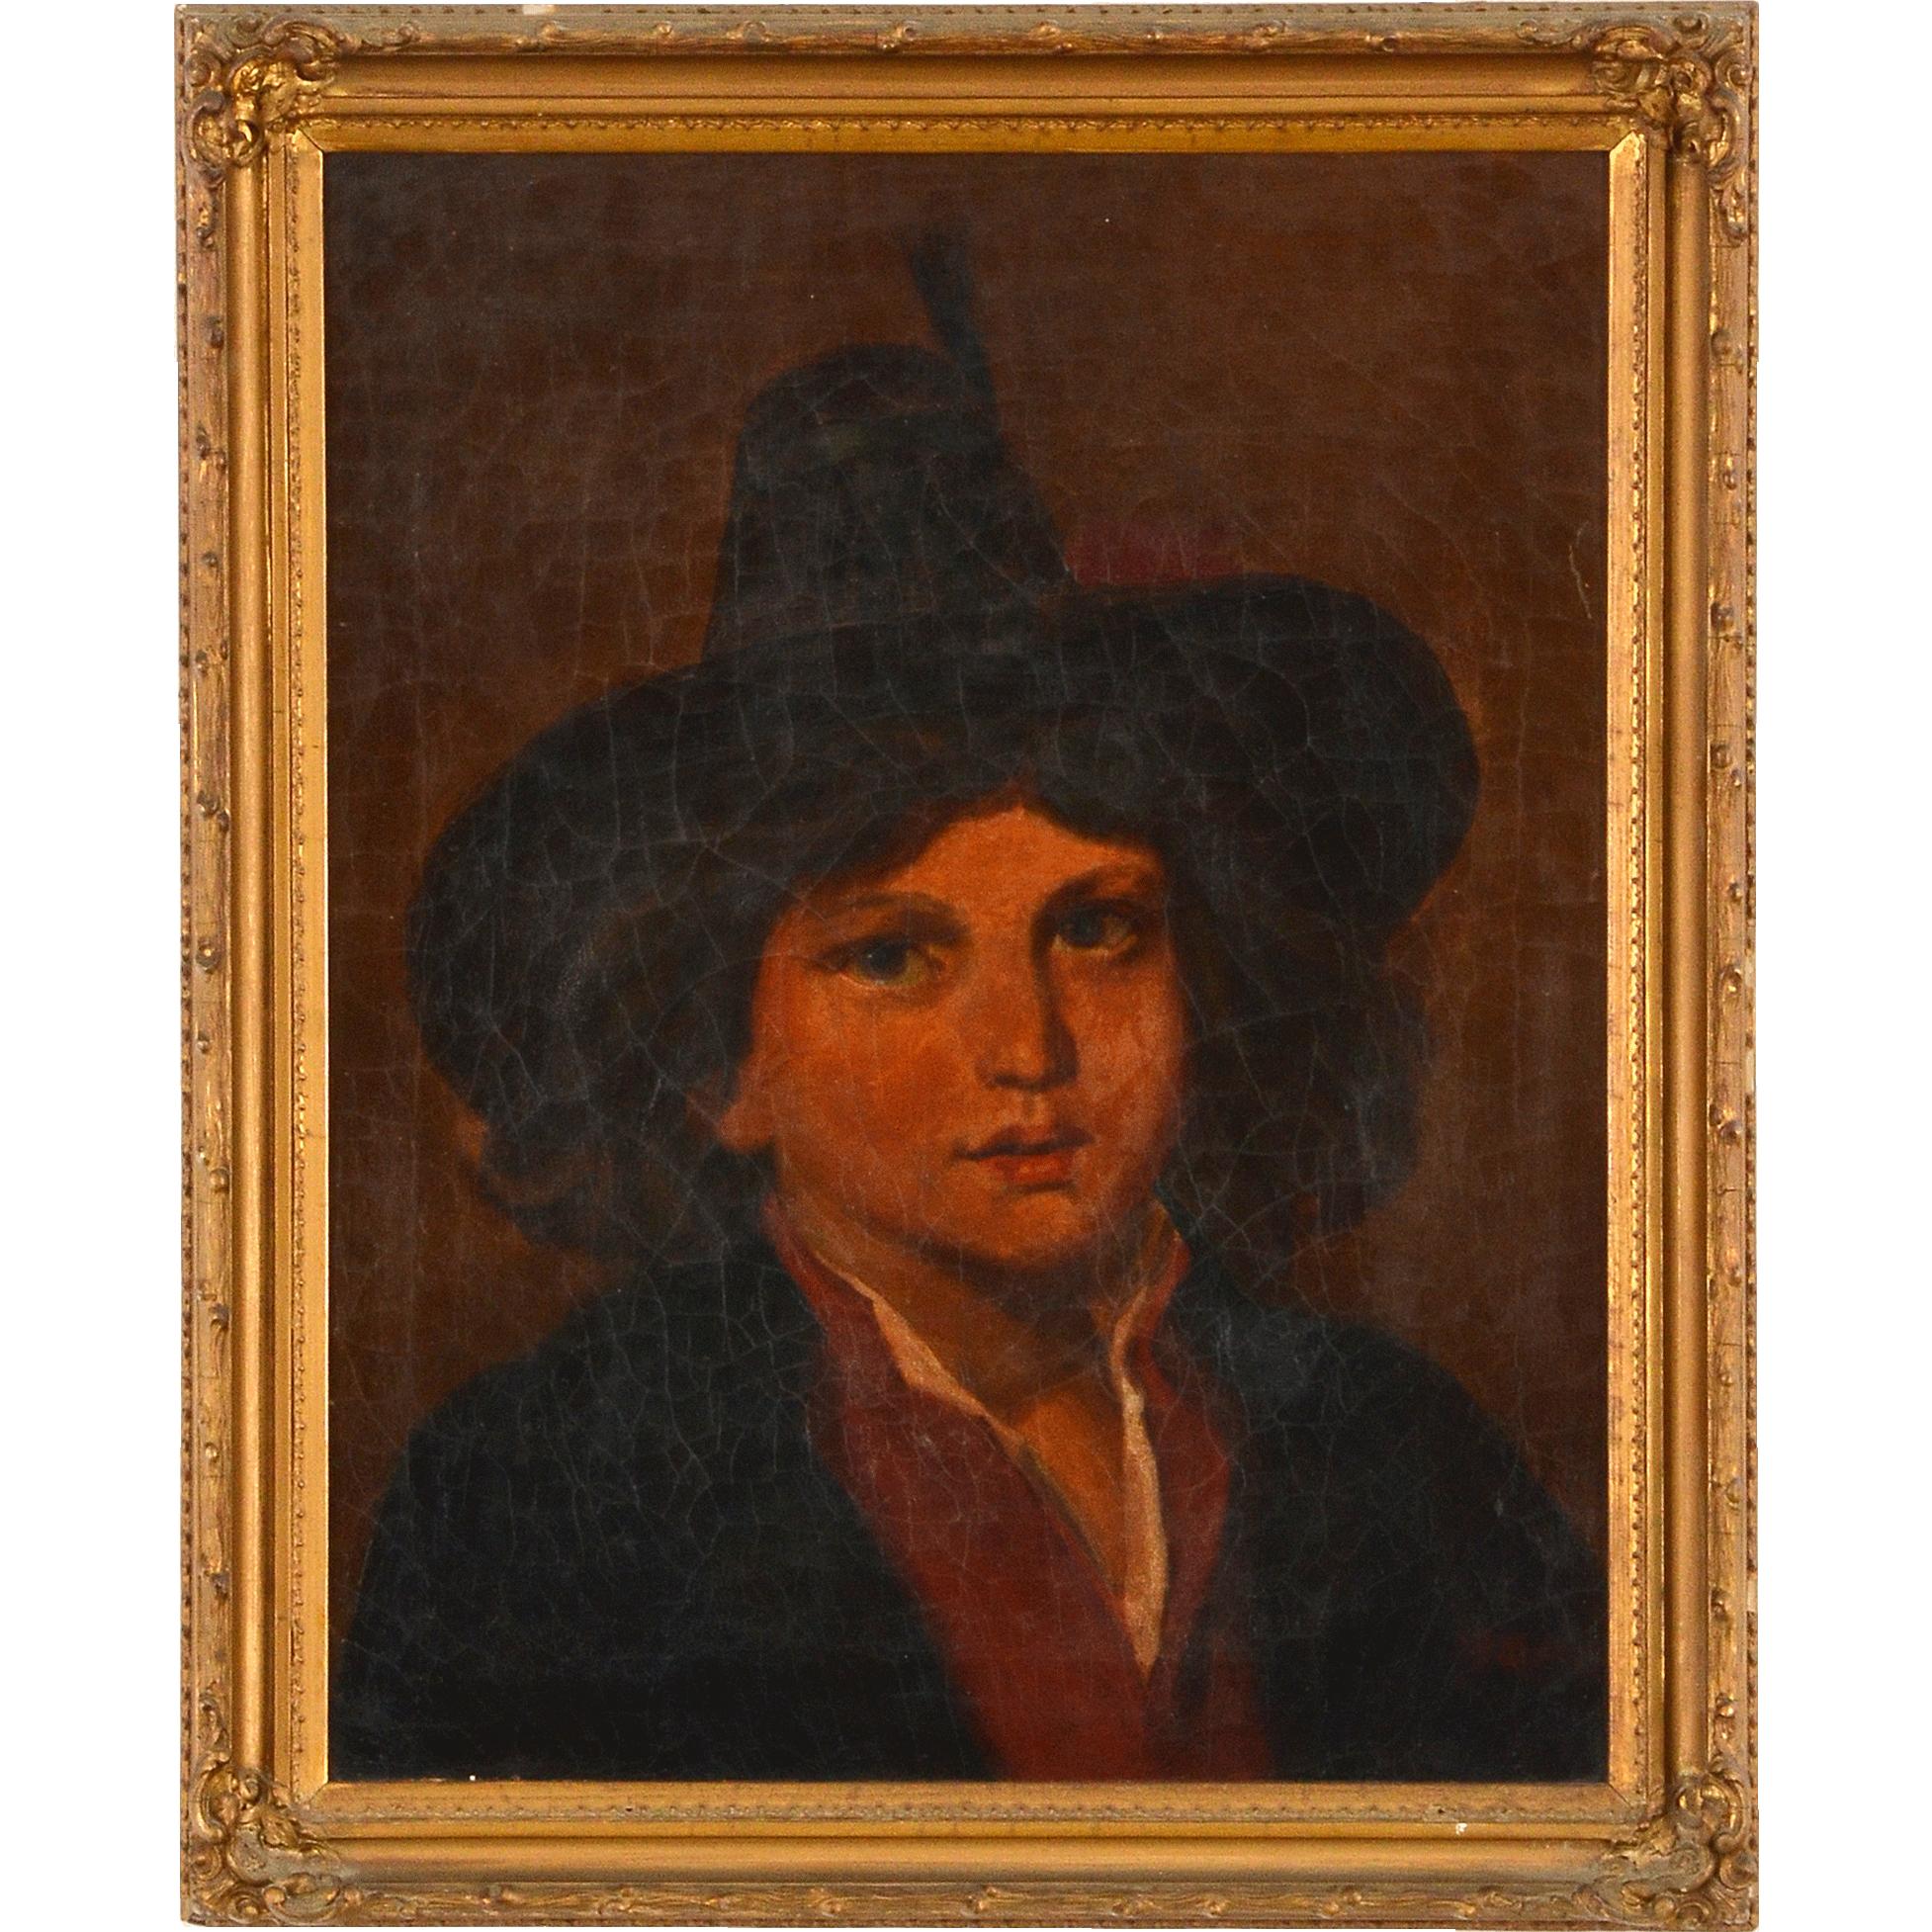 German Oil on Canvas Portrait of a Boy